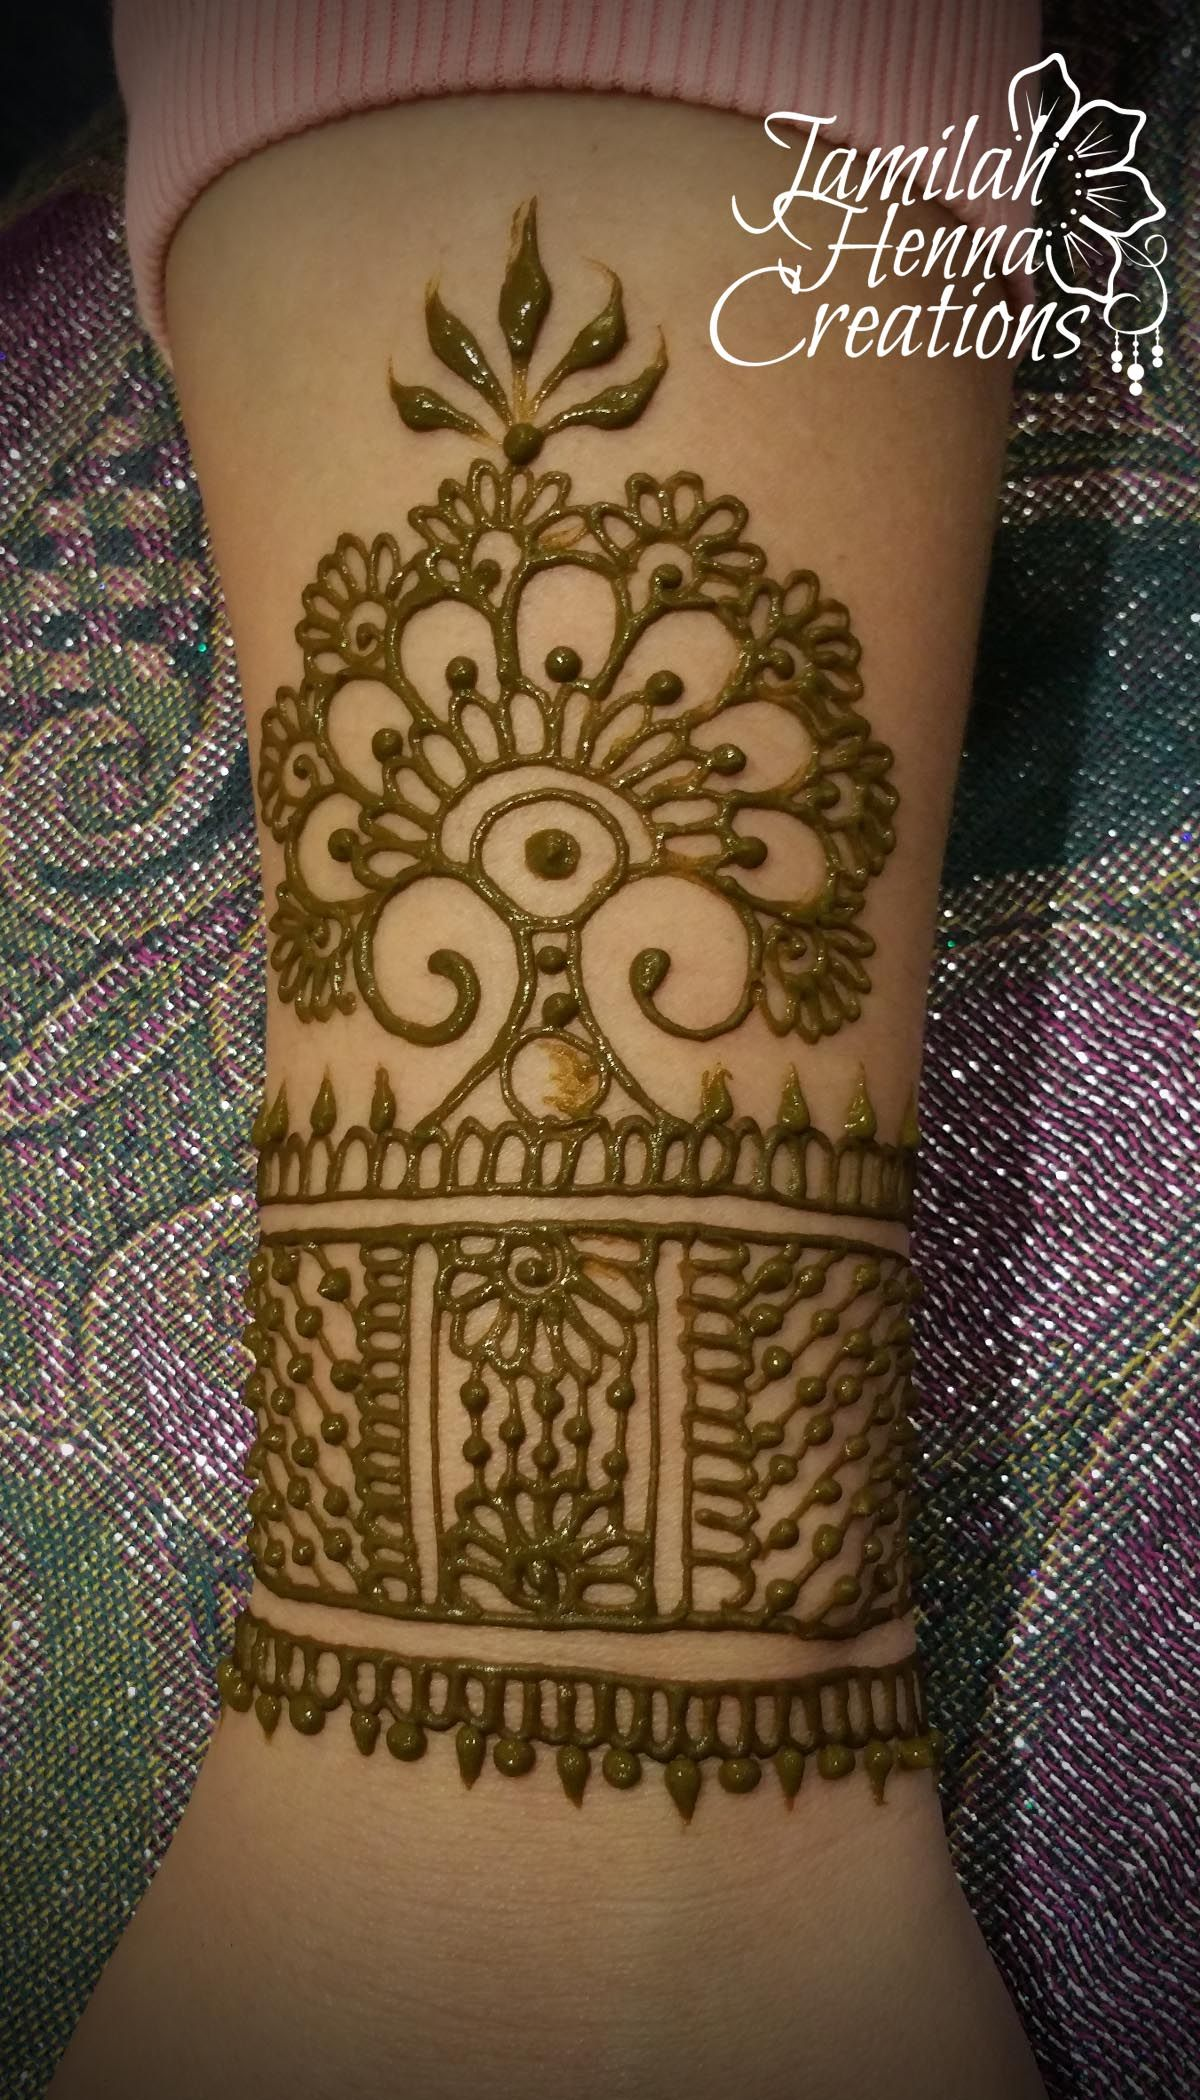 Henna Cuff Www Jamilahhennacreations Com